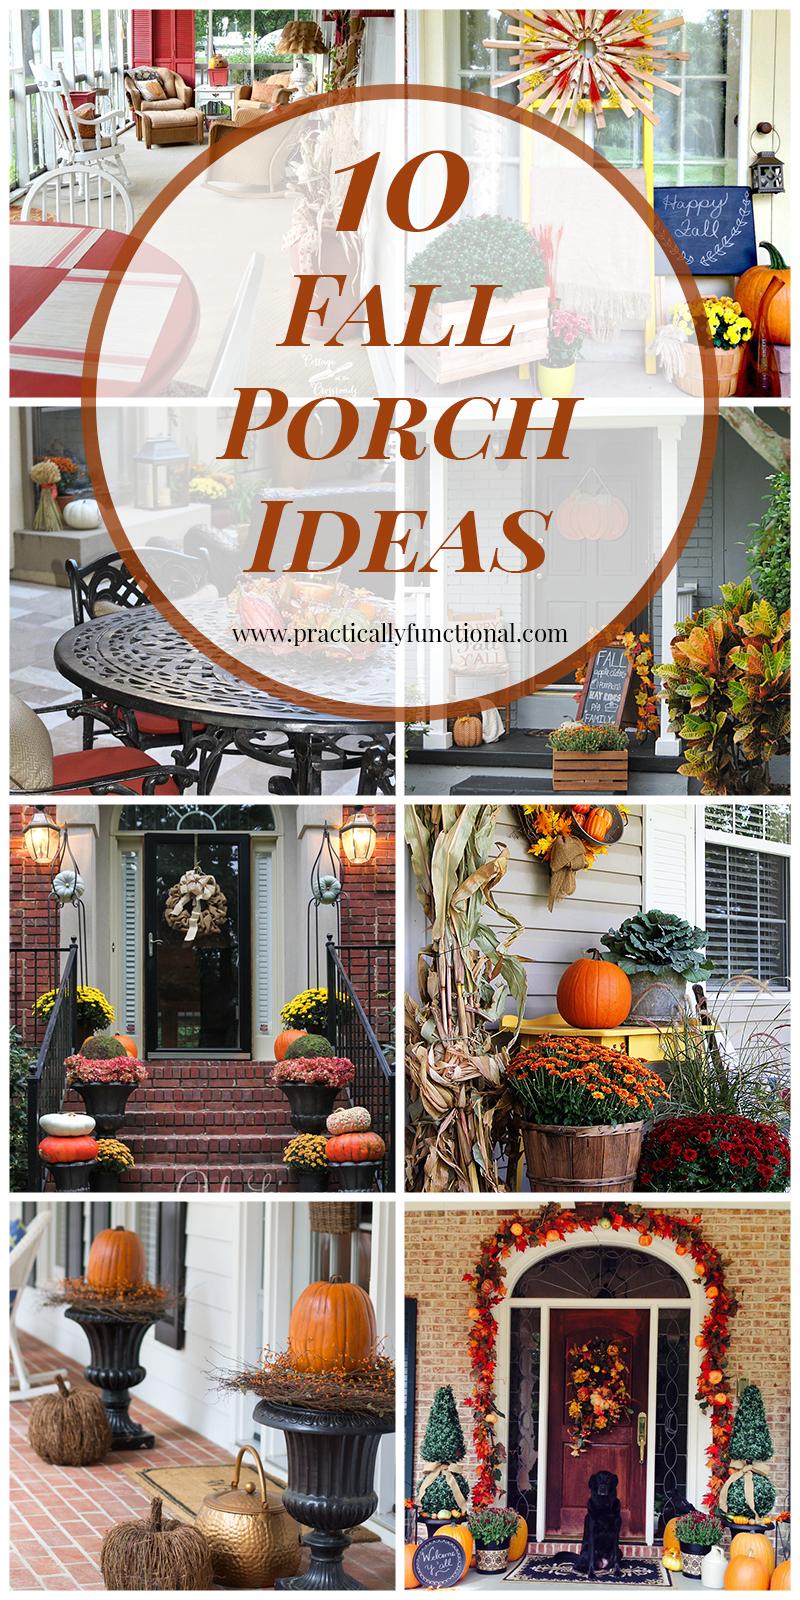 10 fall porch ideas. Black Bedroom Furniture Sets. Home Design Ideas